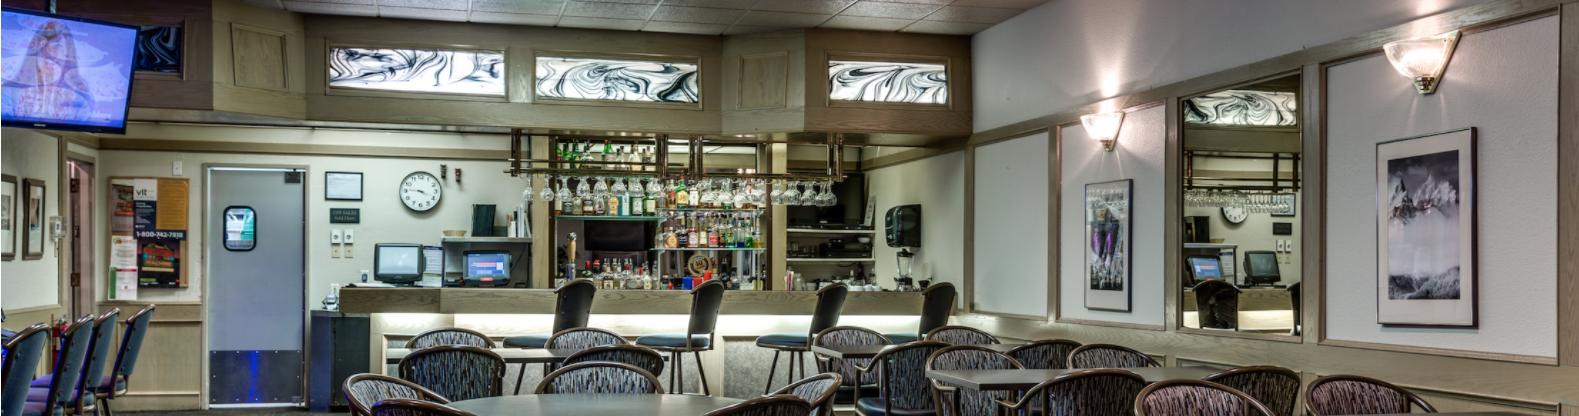 Heritage Inn Pincher Creek Restaurant